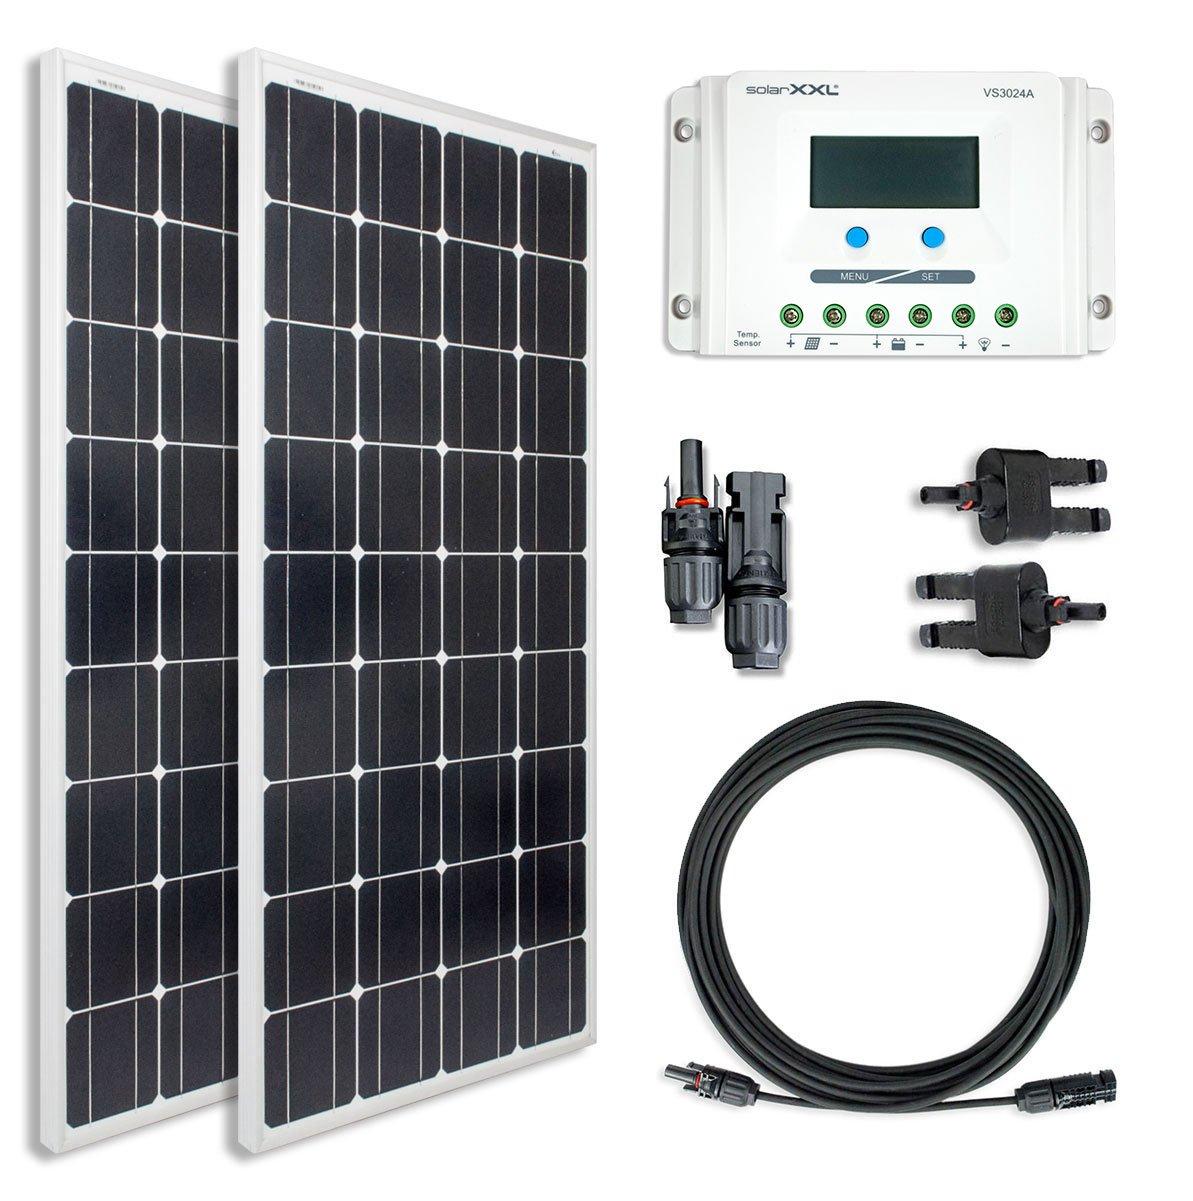 200W Komplettset Solarmodul Mono - Laderegler - Kabel & Stecker - Solarpanel - Camping - solarXXL